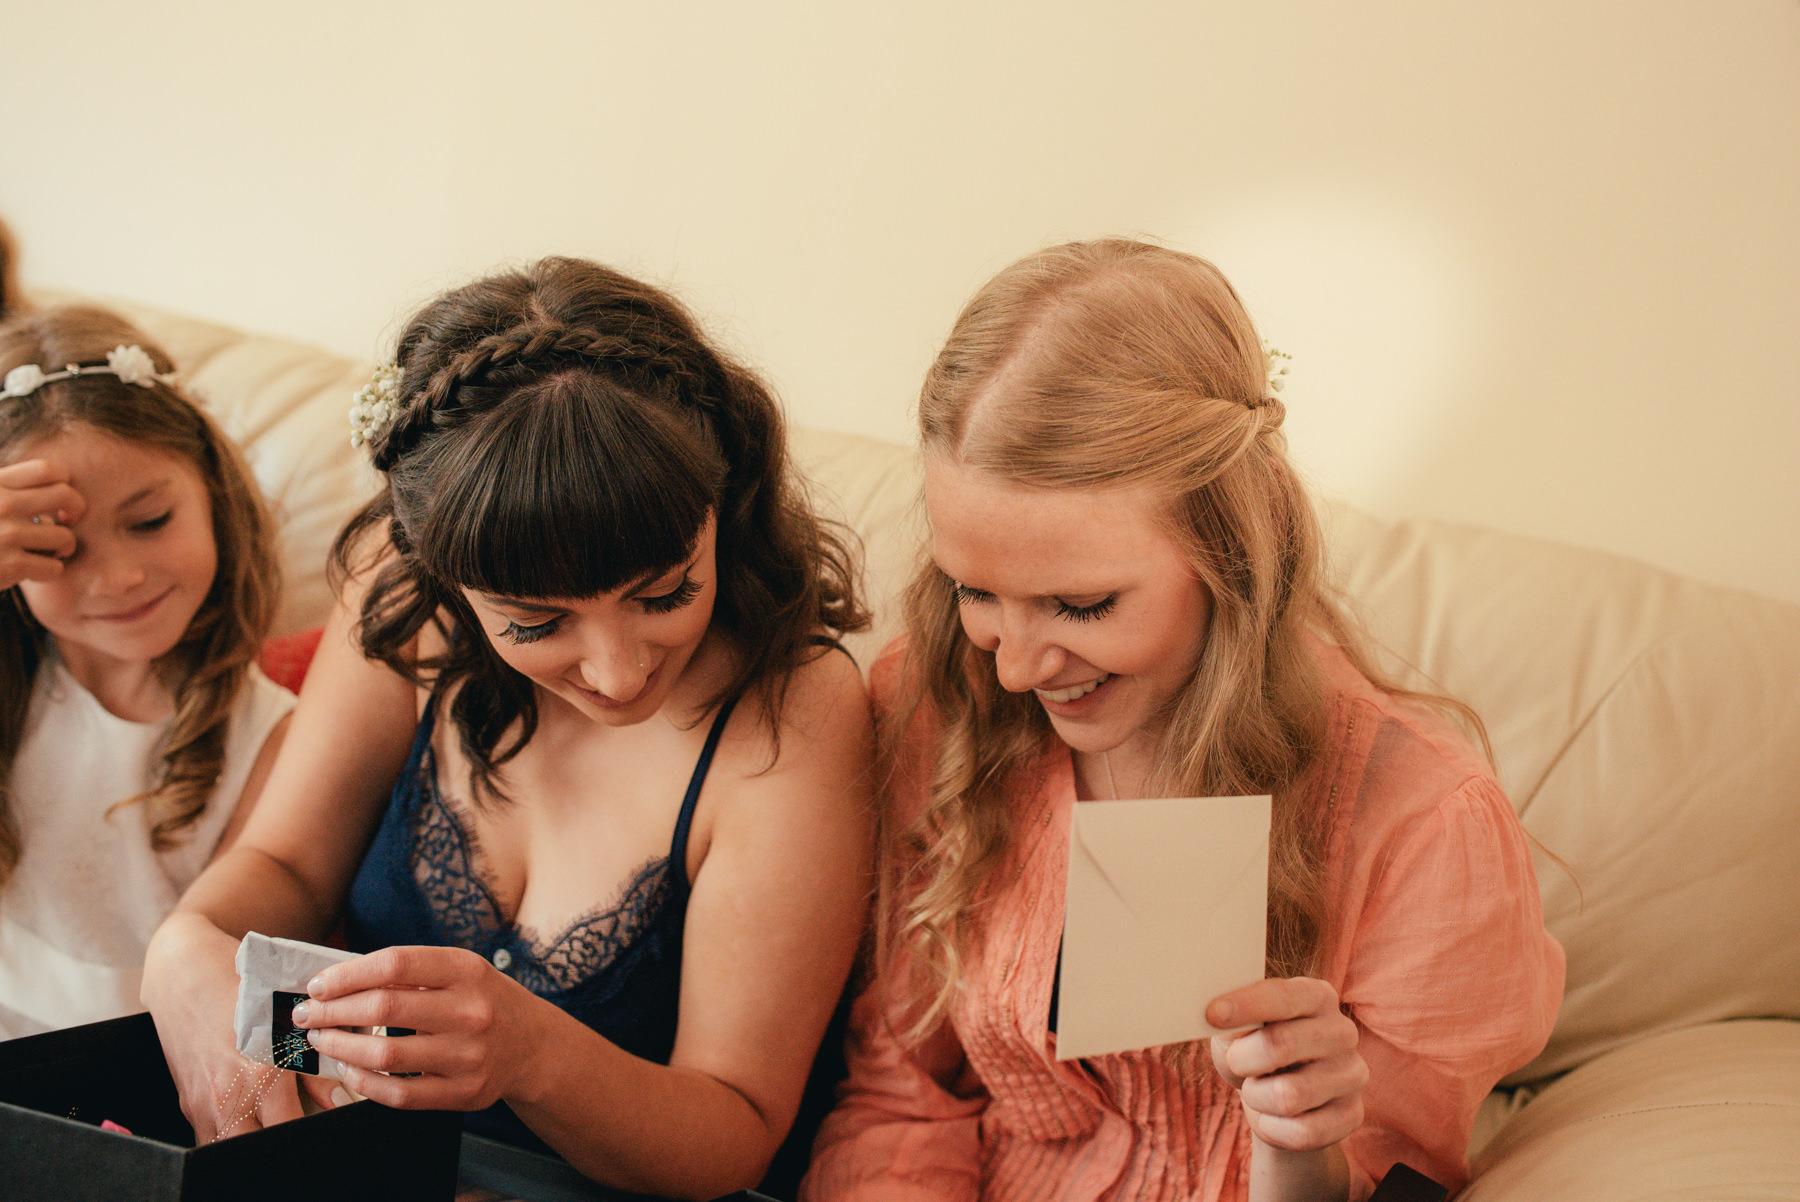 liverpool-wedding-photographer-7